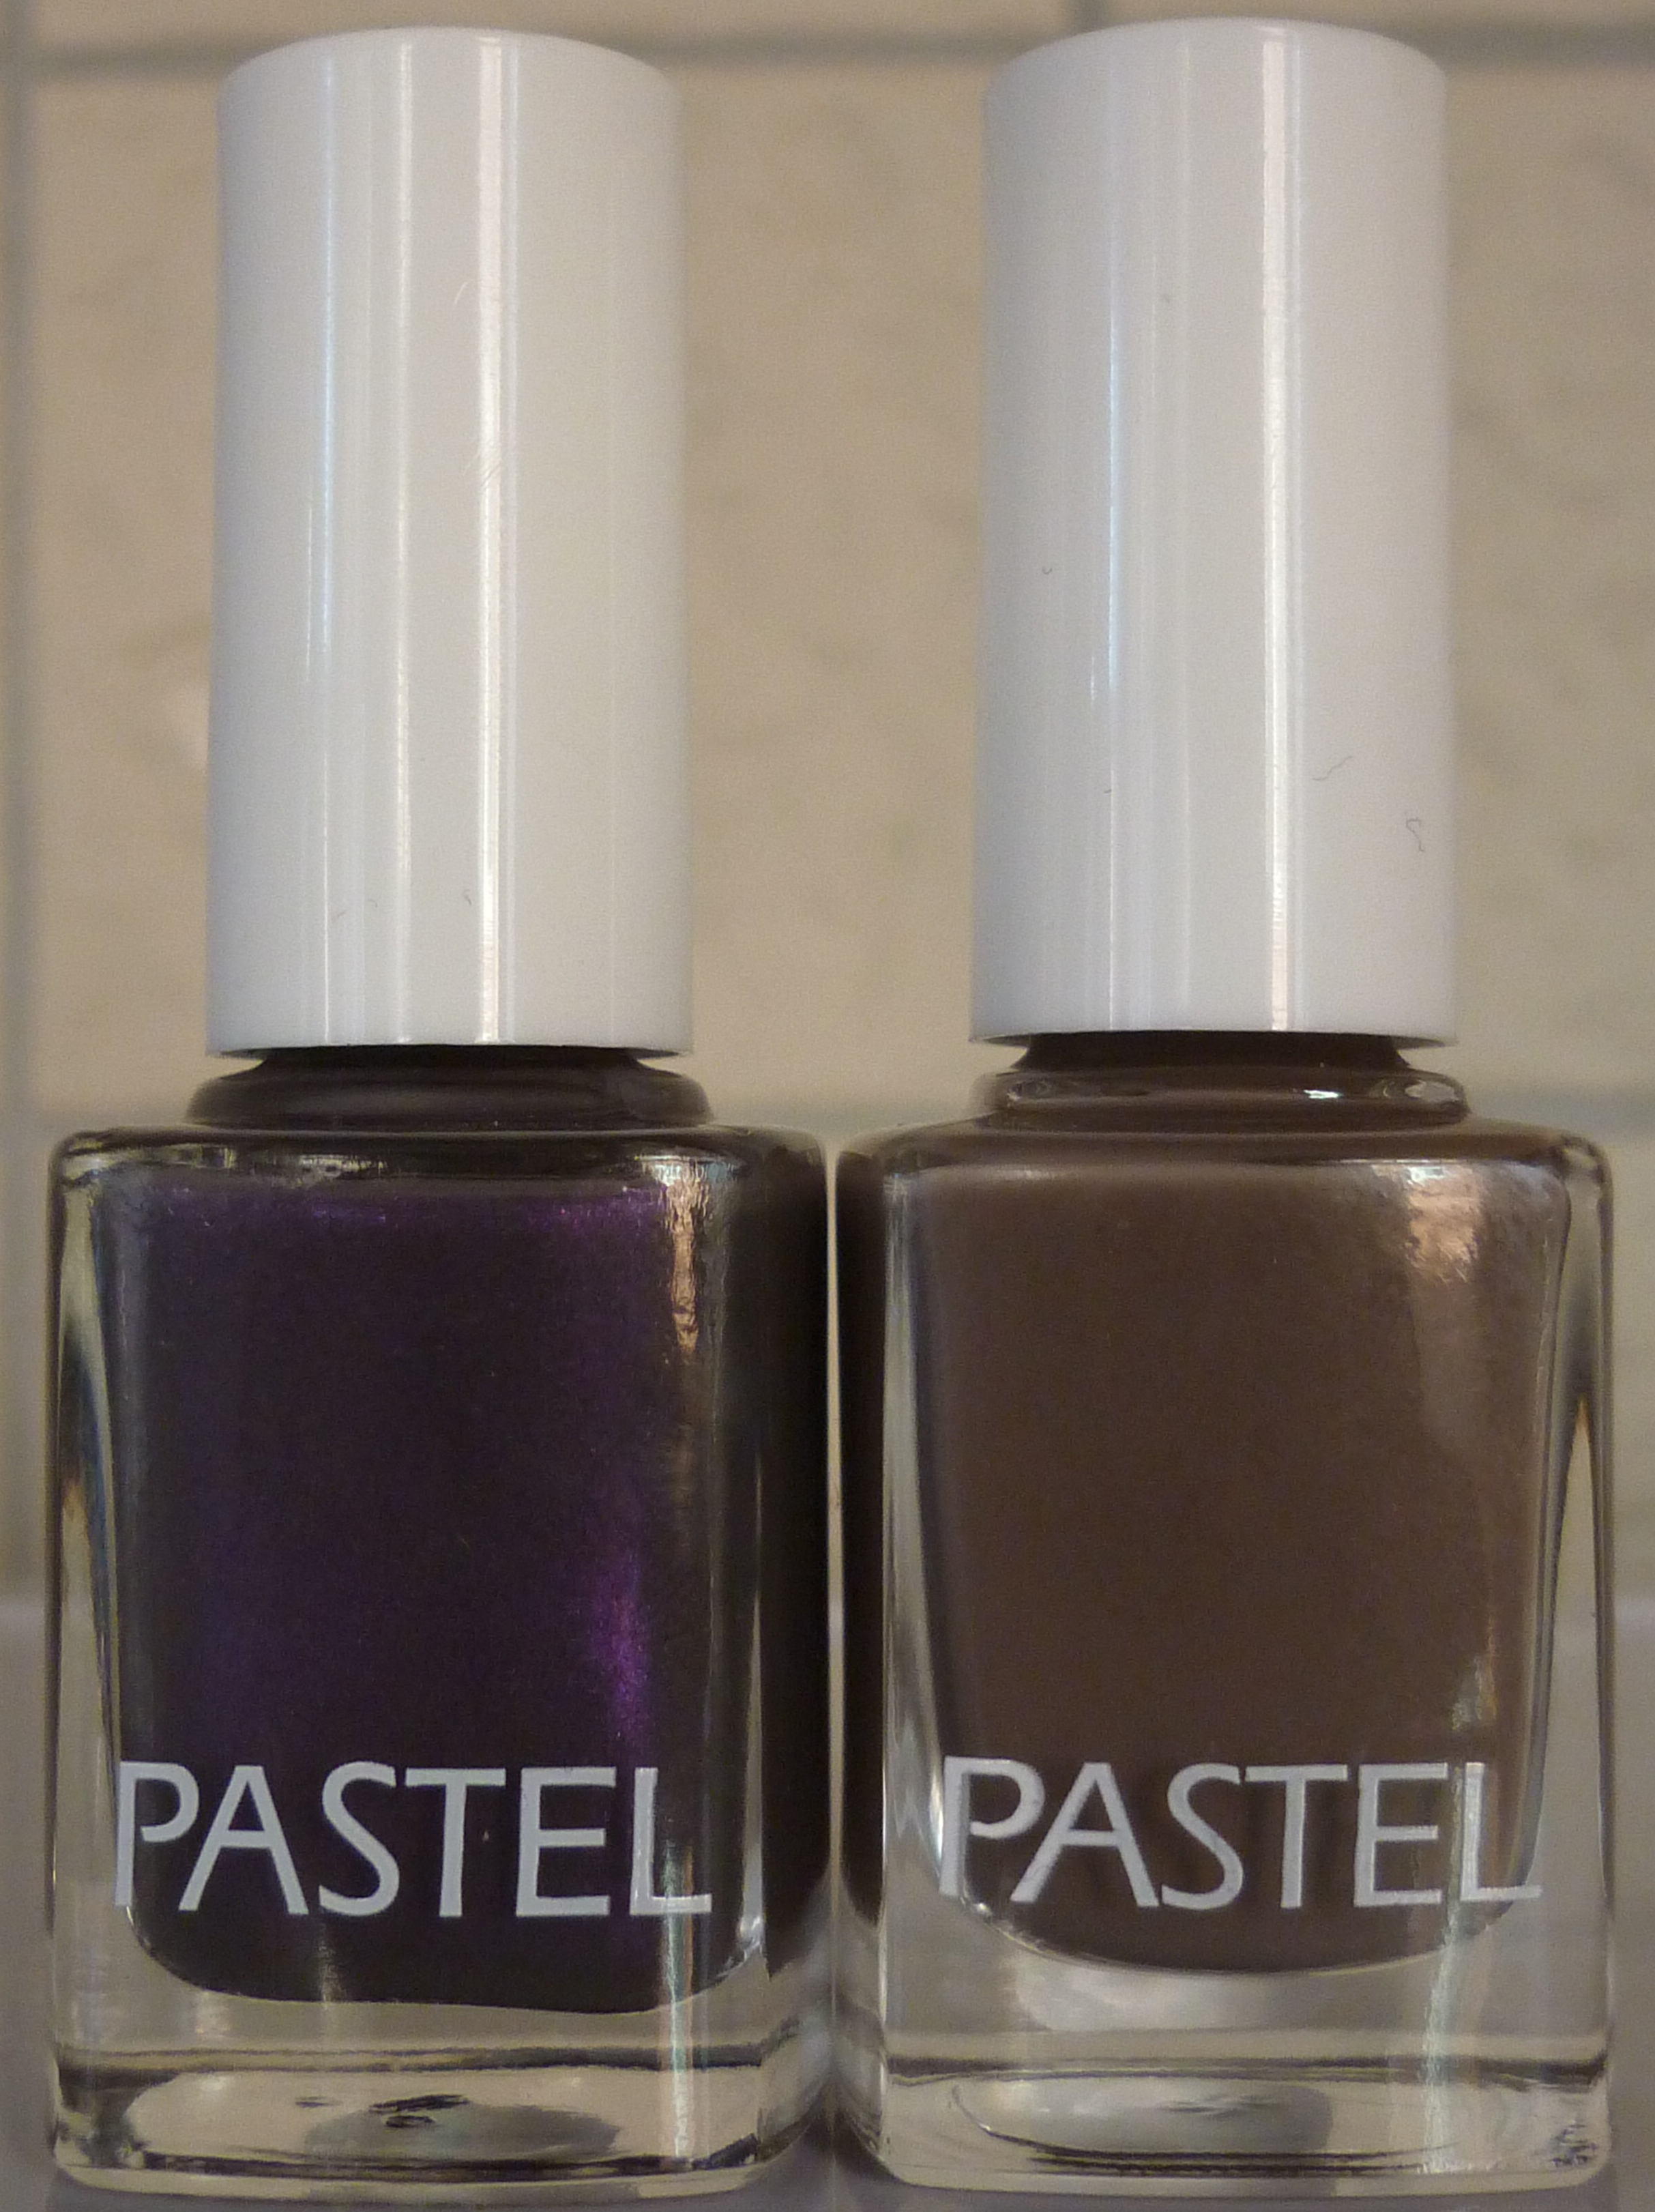 Globalisierte Nagellack-Trends | Beautyjagd